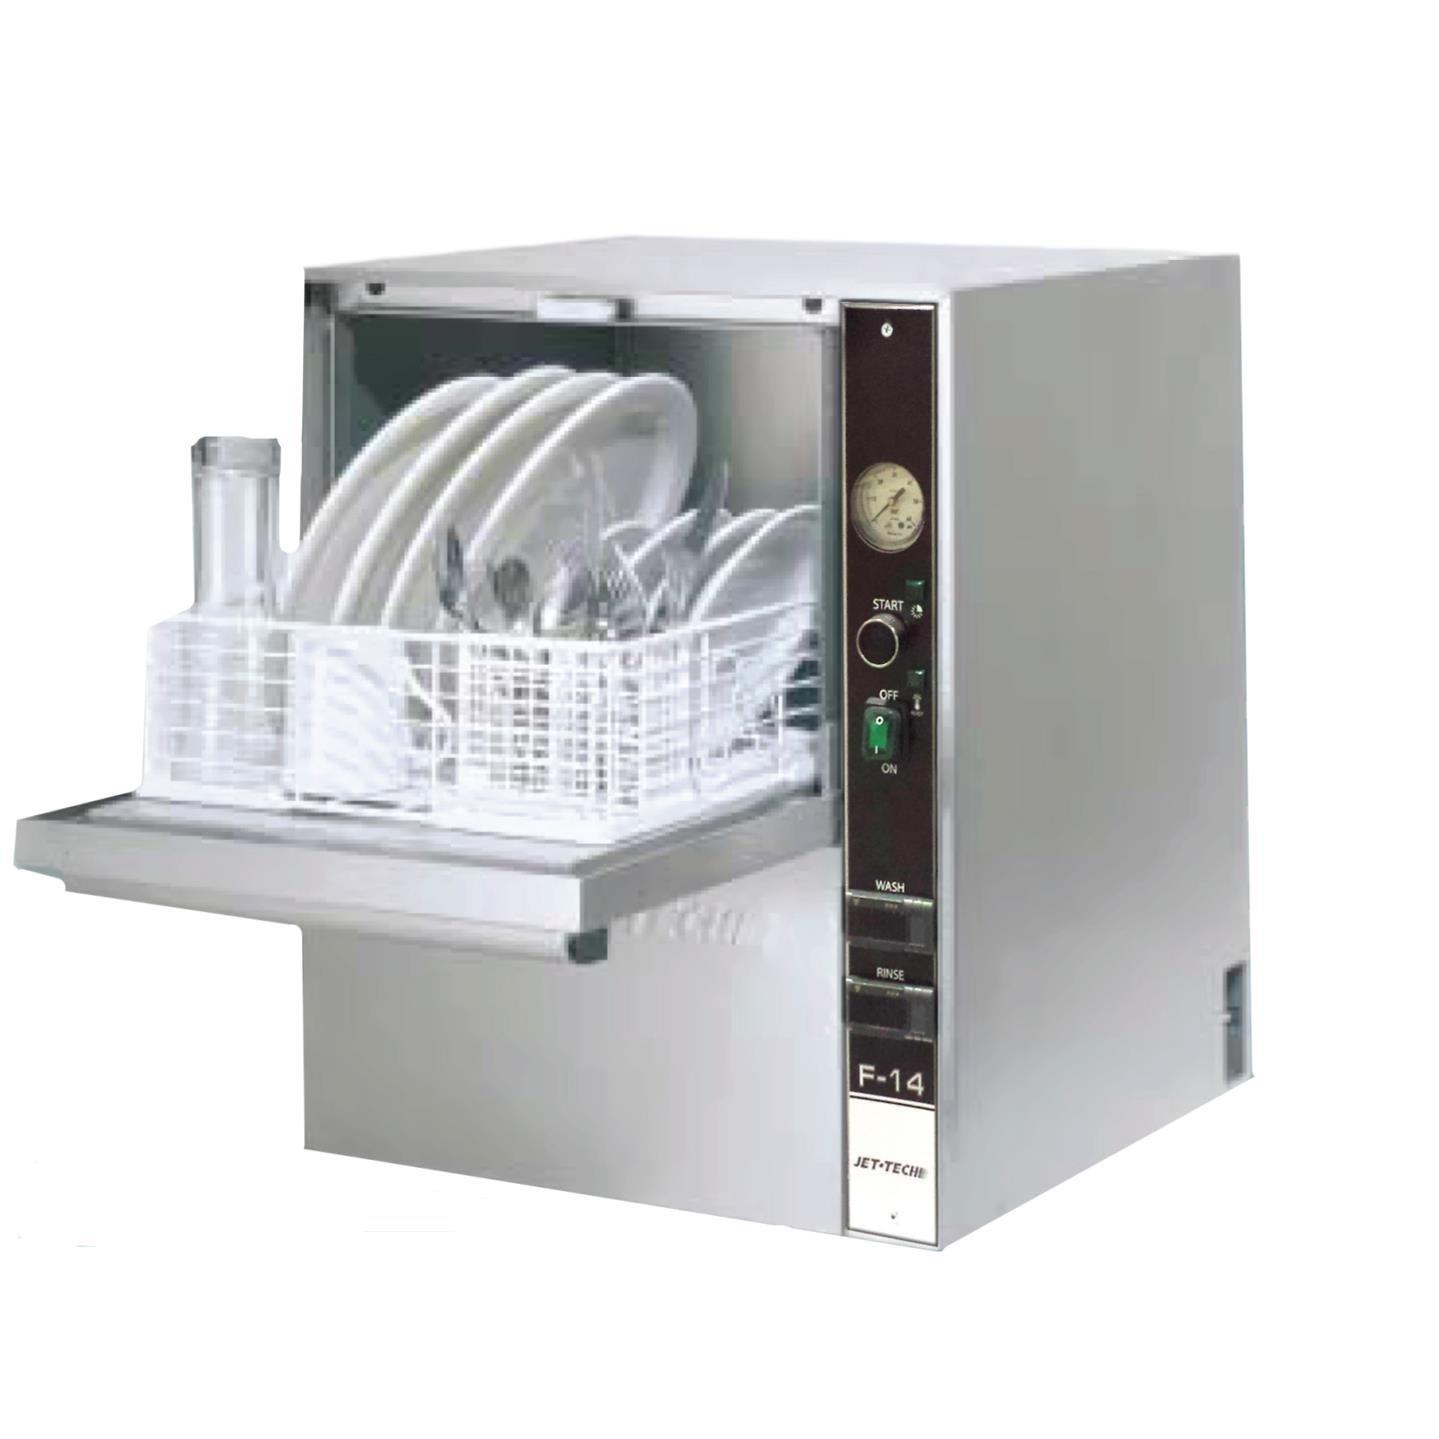 Miniature Dishwasher Portable Countertop Dishwashers Amazoncom